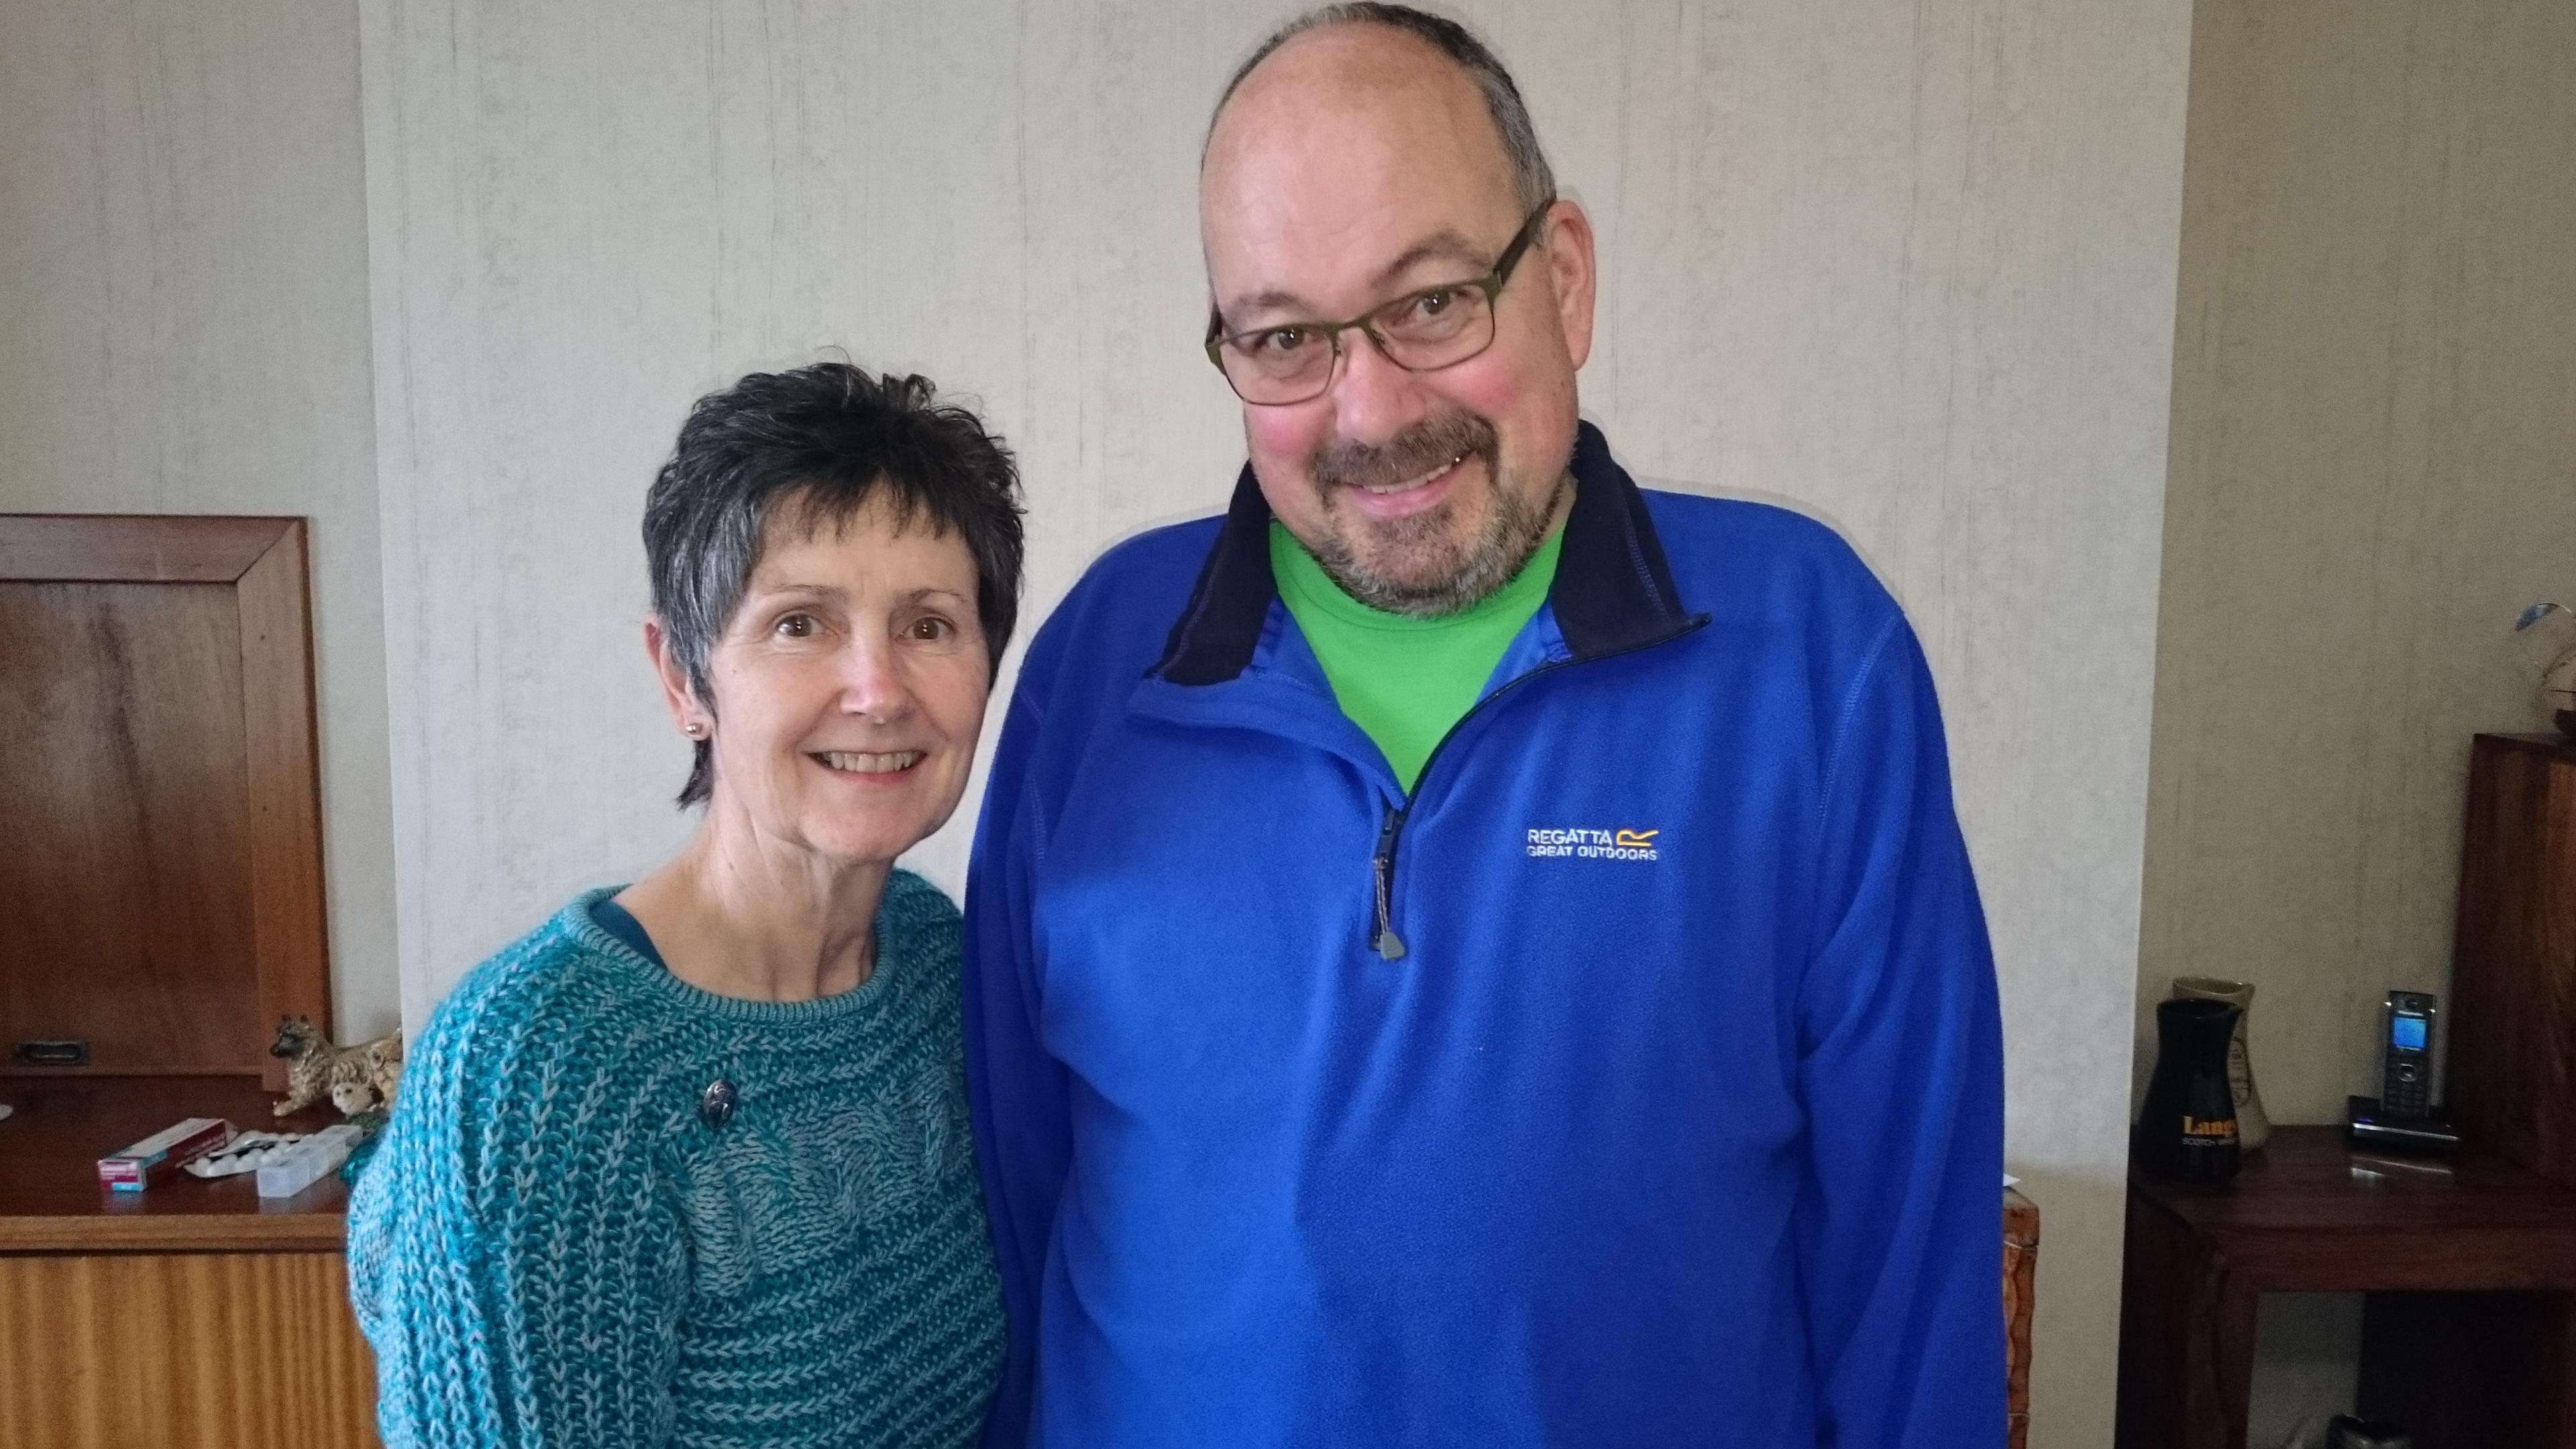 Iain and Joyce Donachie